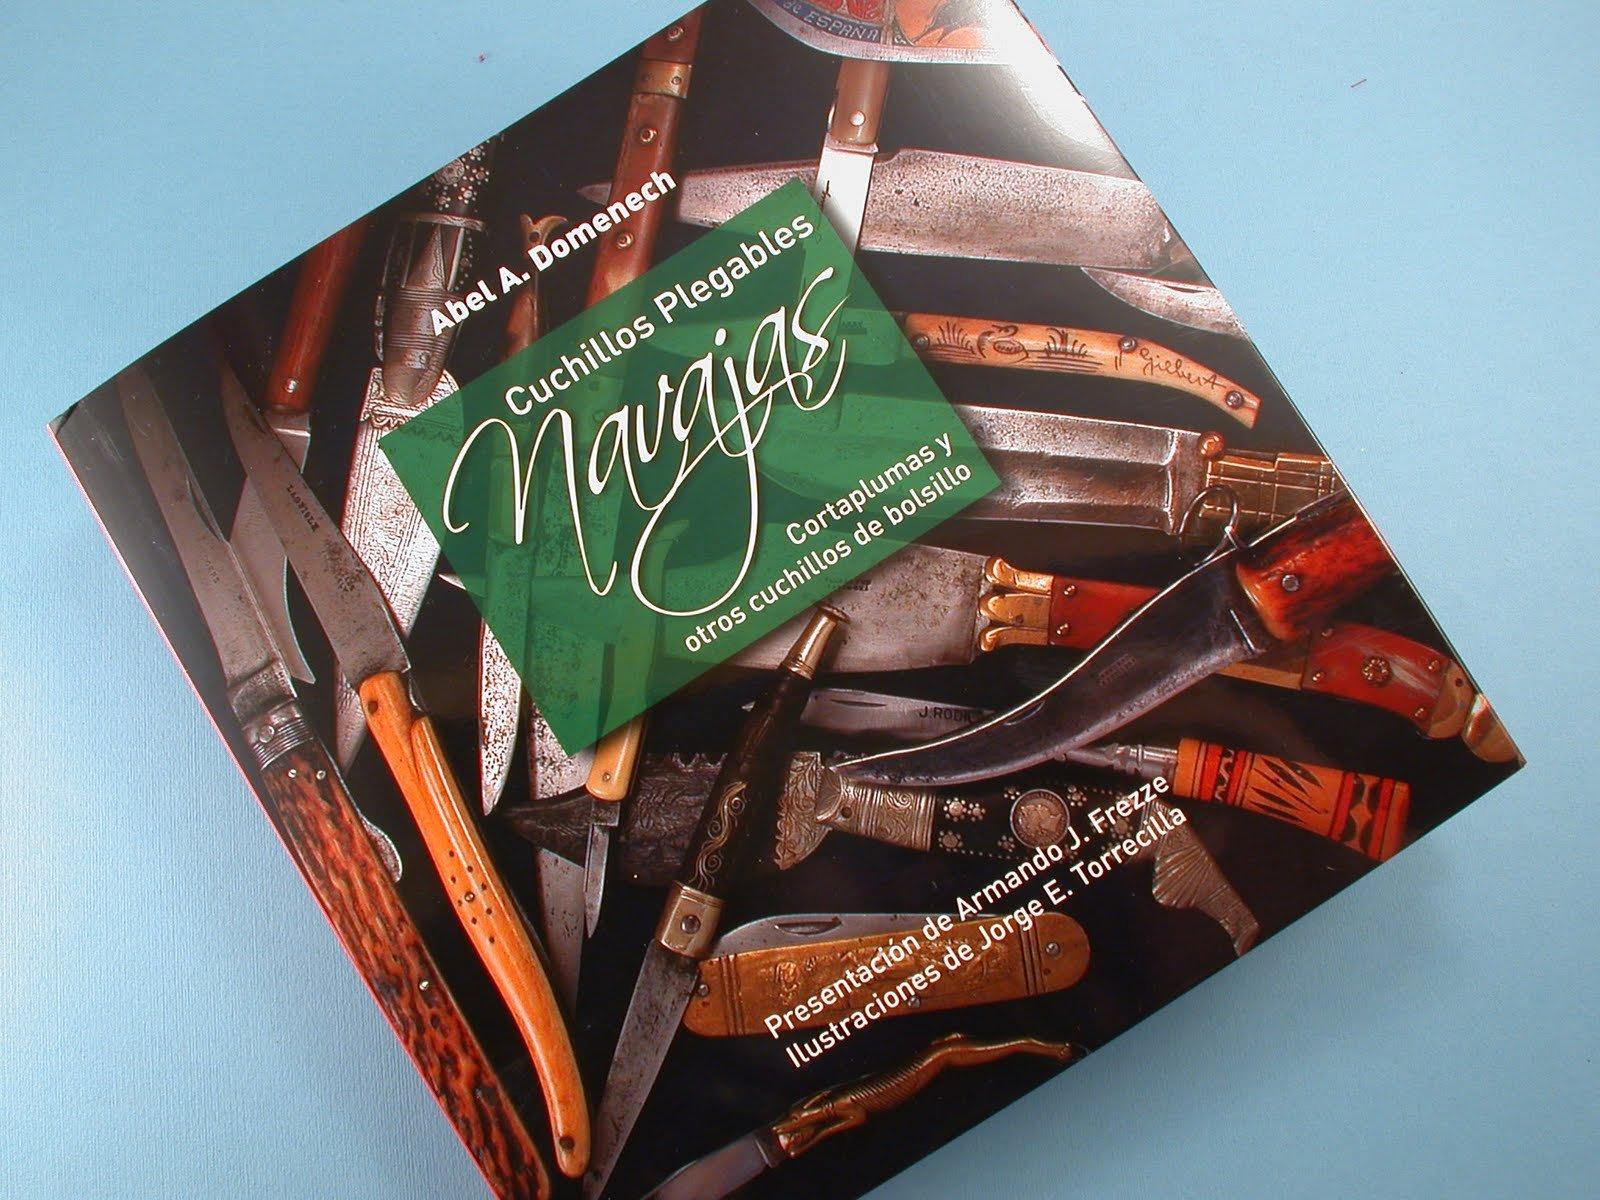 Cuchillos Plegables, Navajas, Cortaplumas Y Otros Cuchillos ...